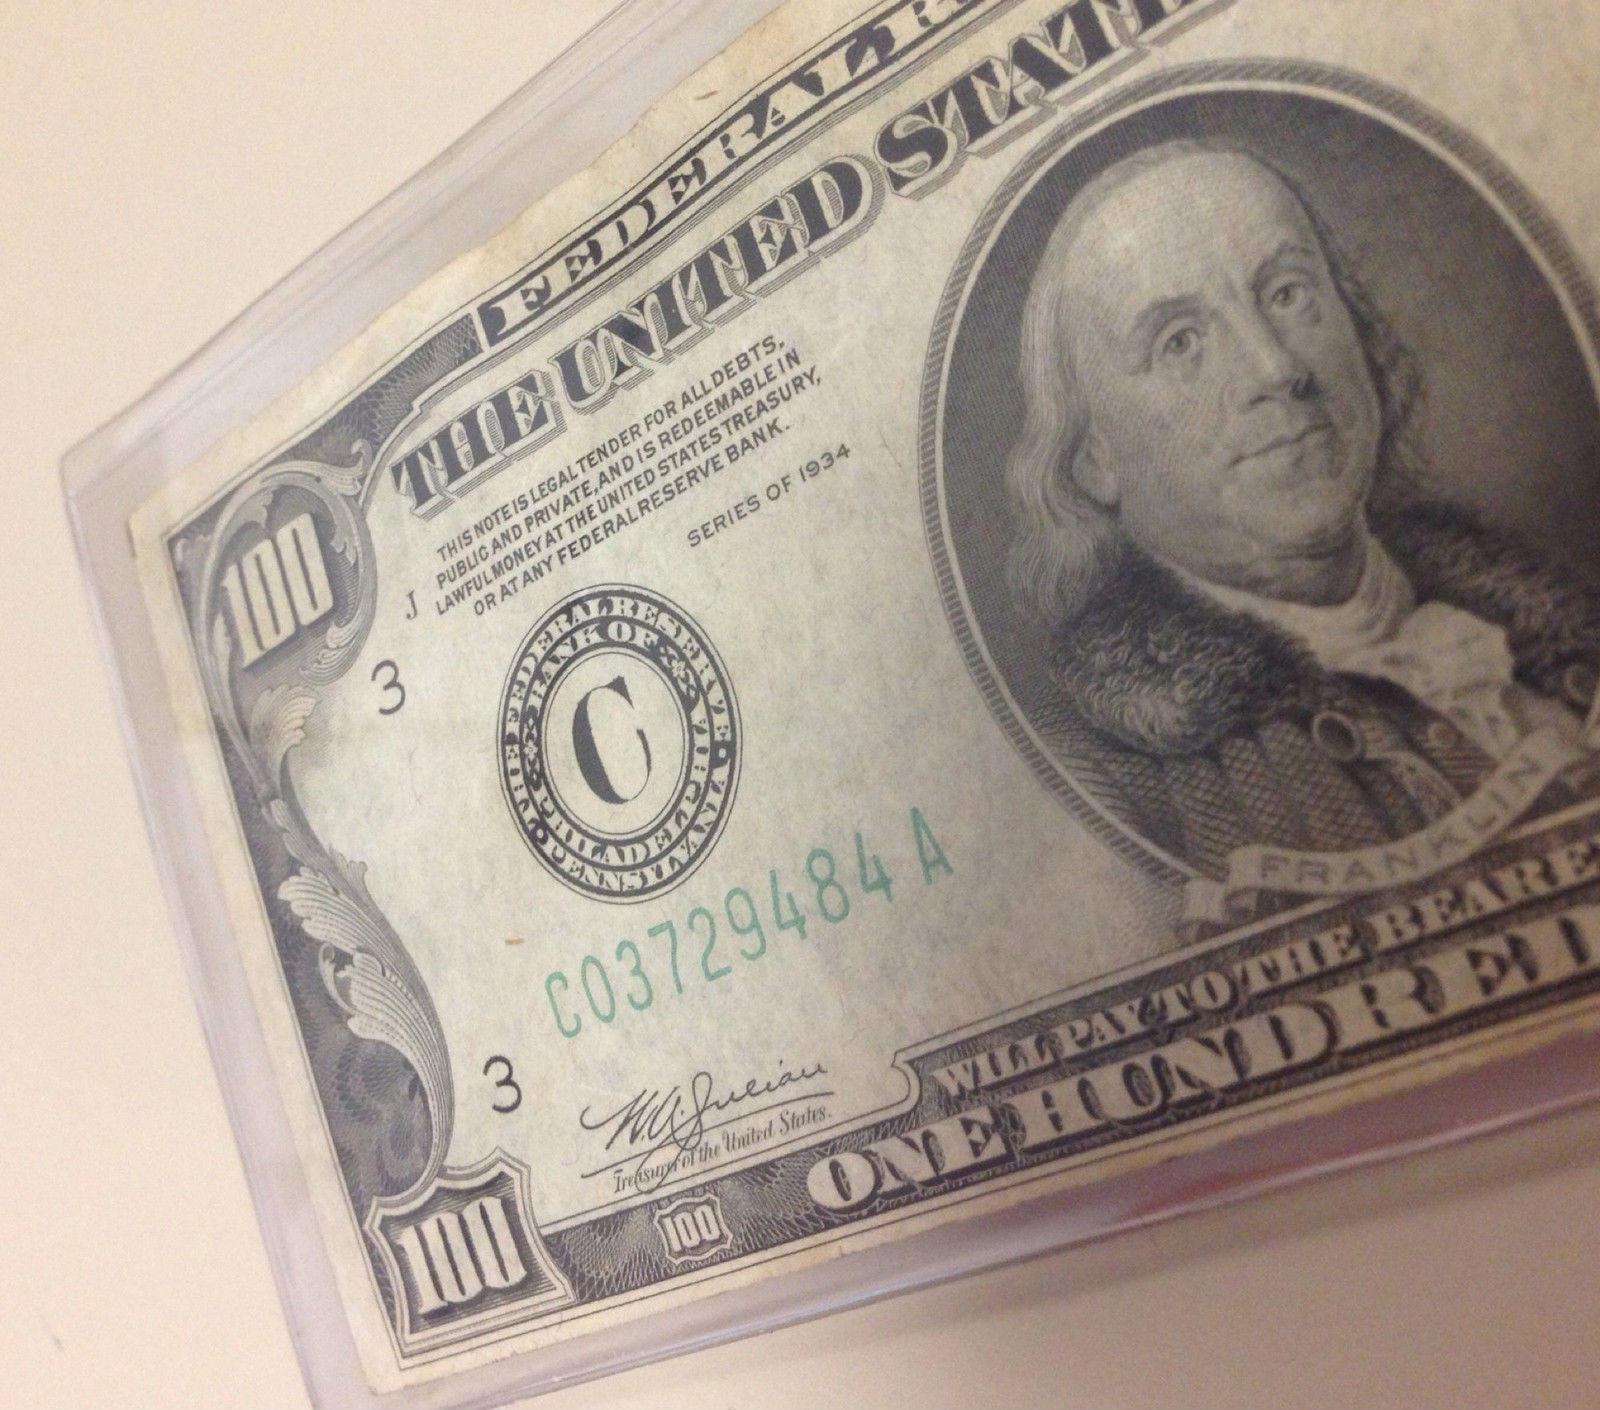 2003 $2 NEW YORK FRN SCARCE SHEET ISSUE. PMG GEM UNCIRCULATED 66 EPQ BANKNOTE